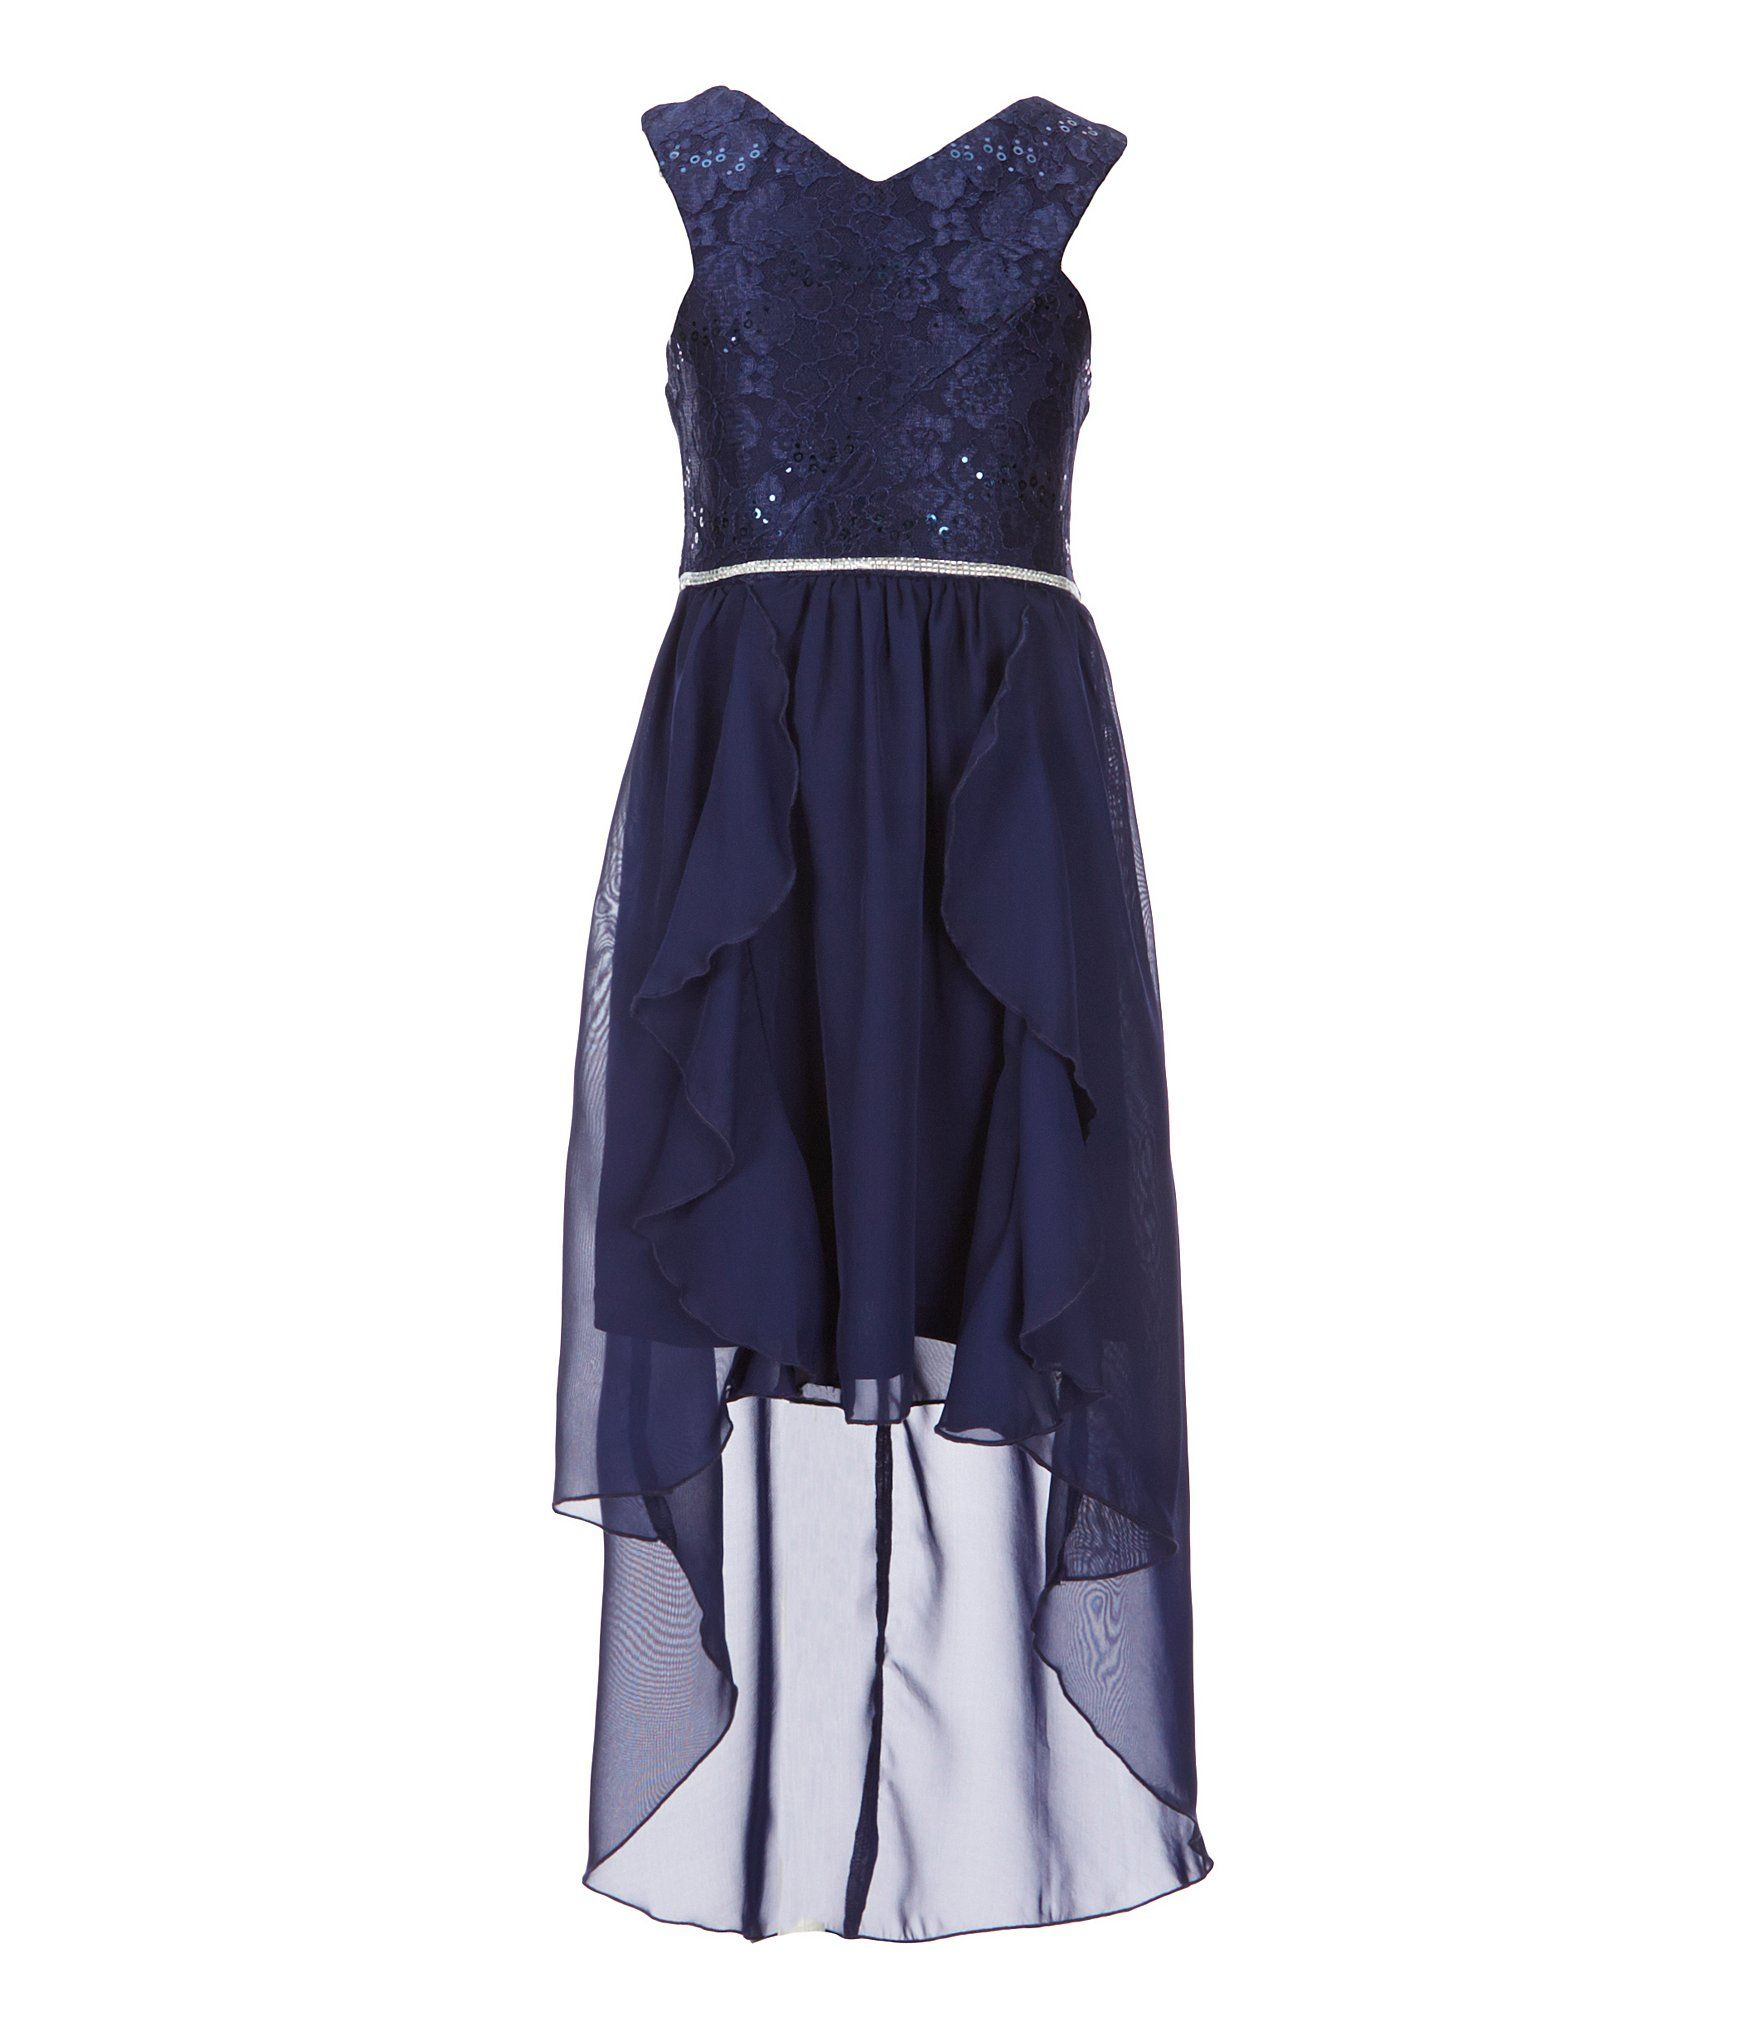 Tween diva big girls crossoverbodice fitandflare dress